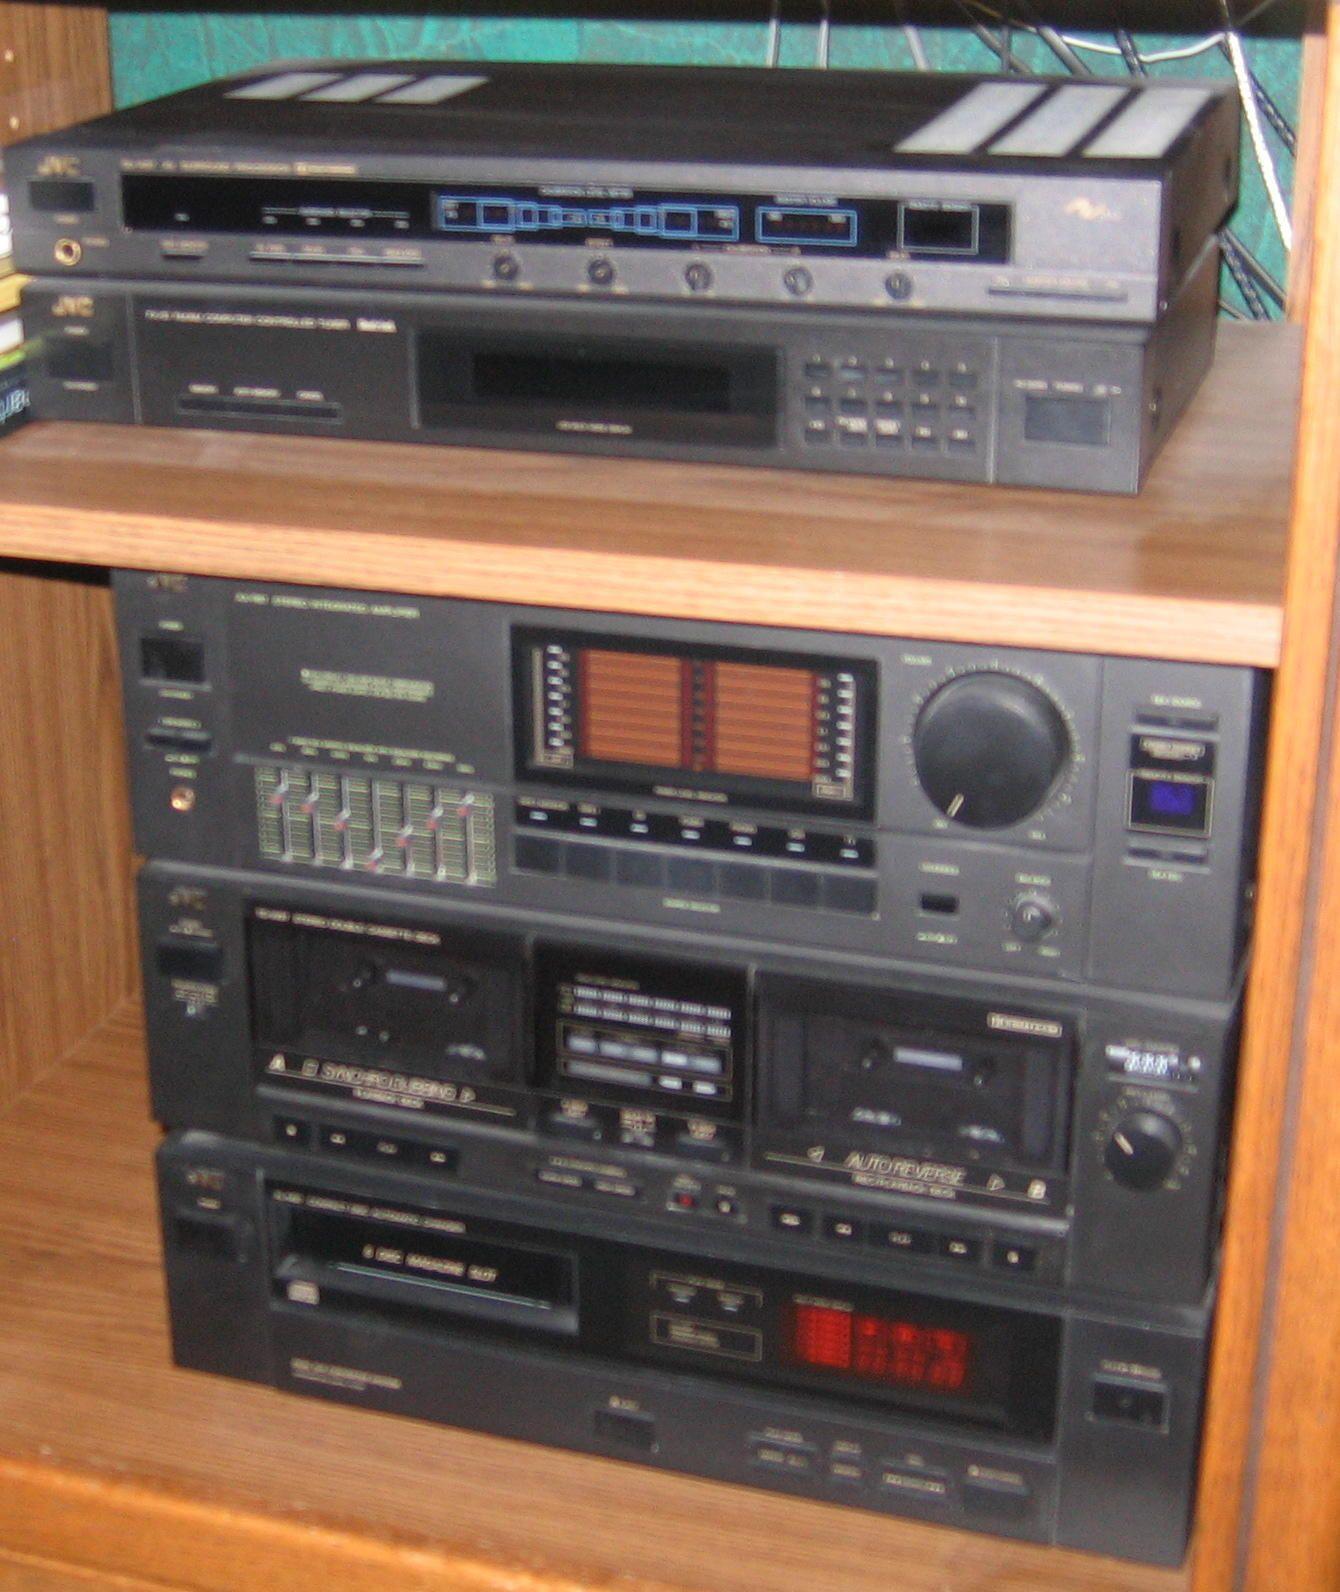 jvc surround sound system and speakers yard sale 10 24. Black Bedroom Furniture Sets. Home Design Ideas